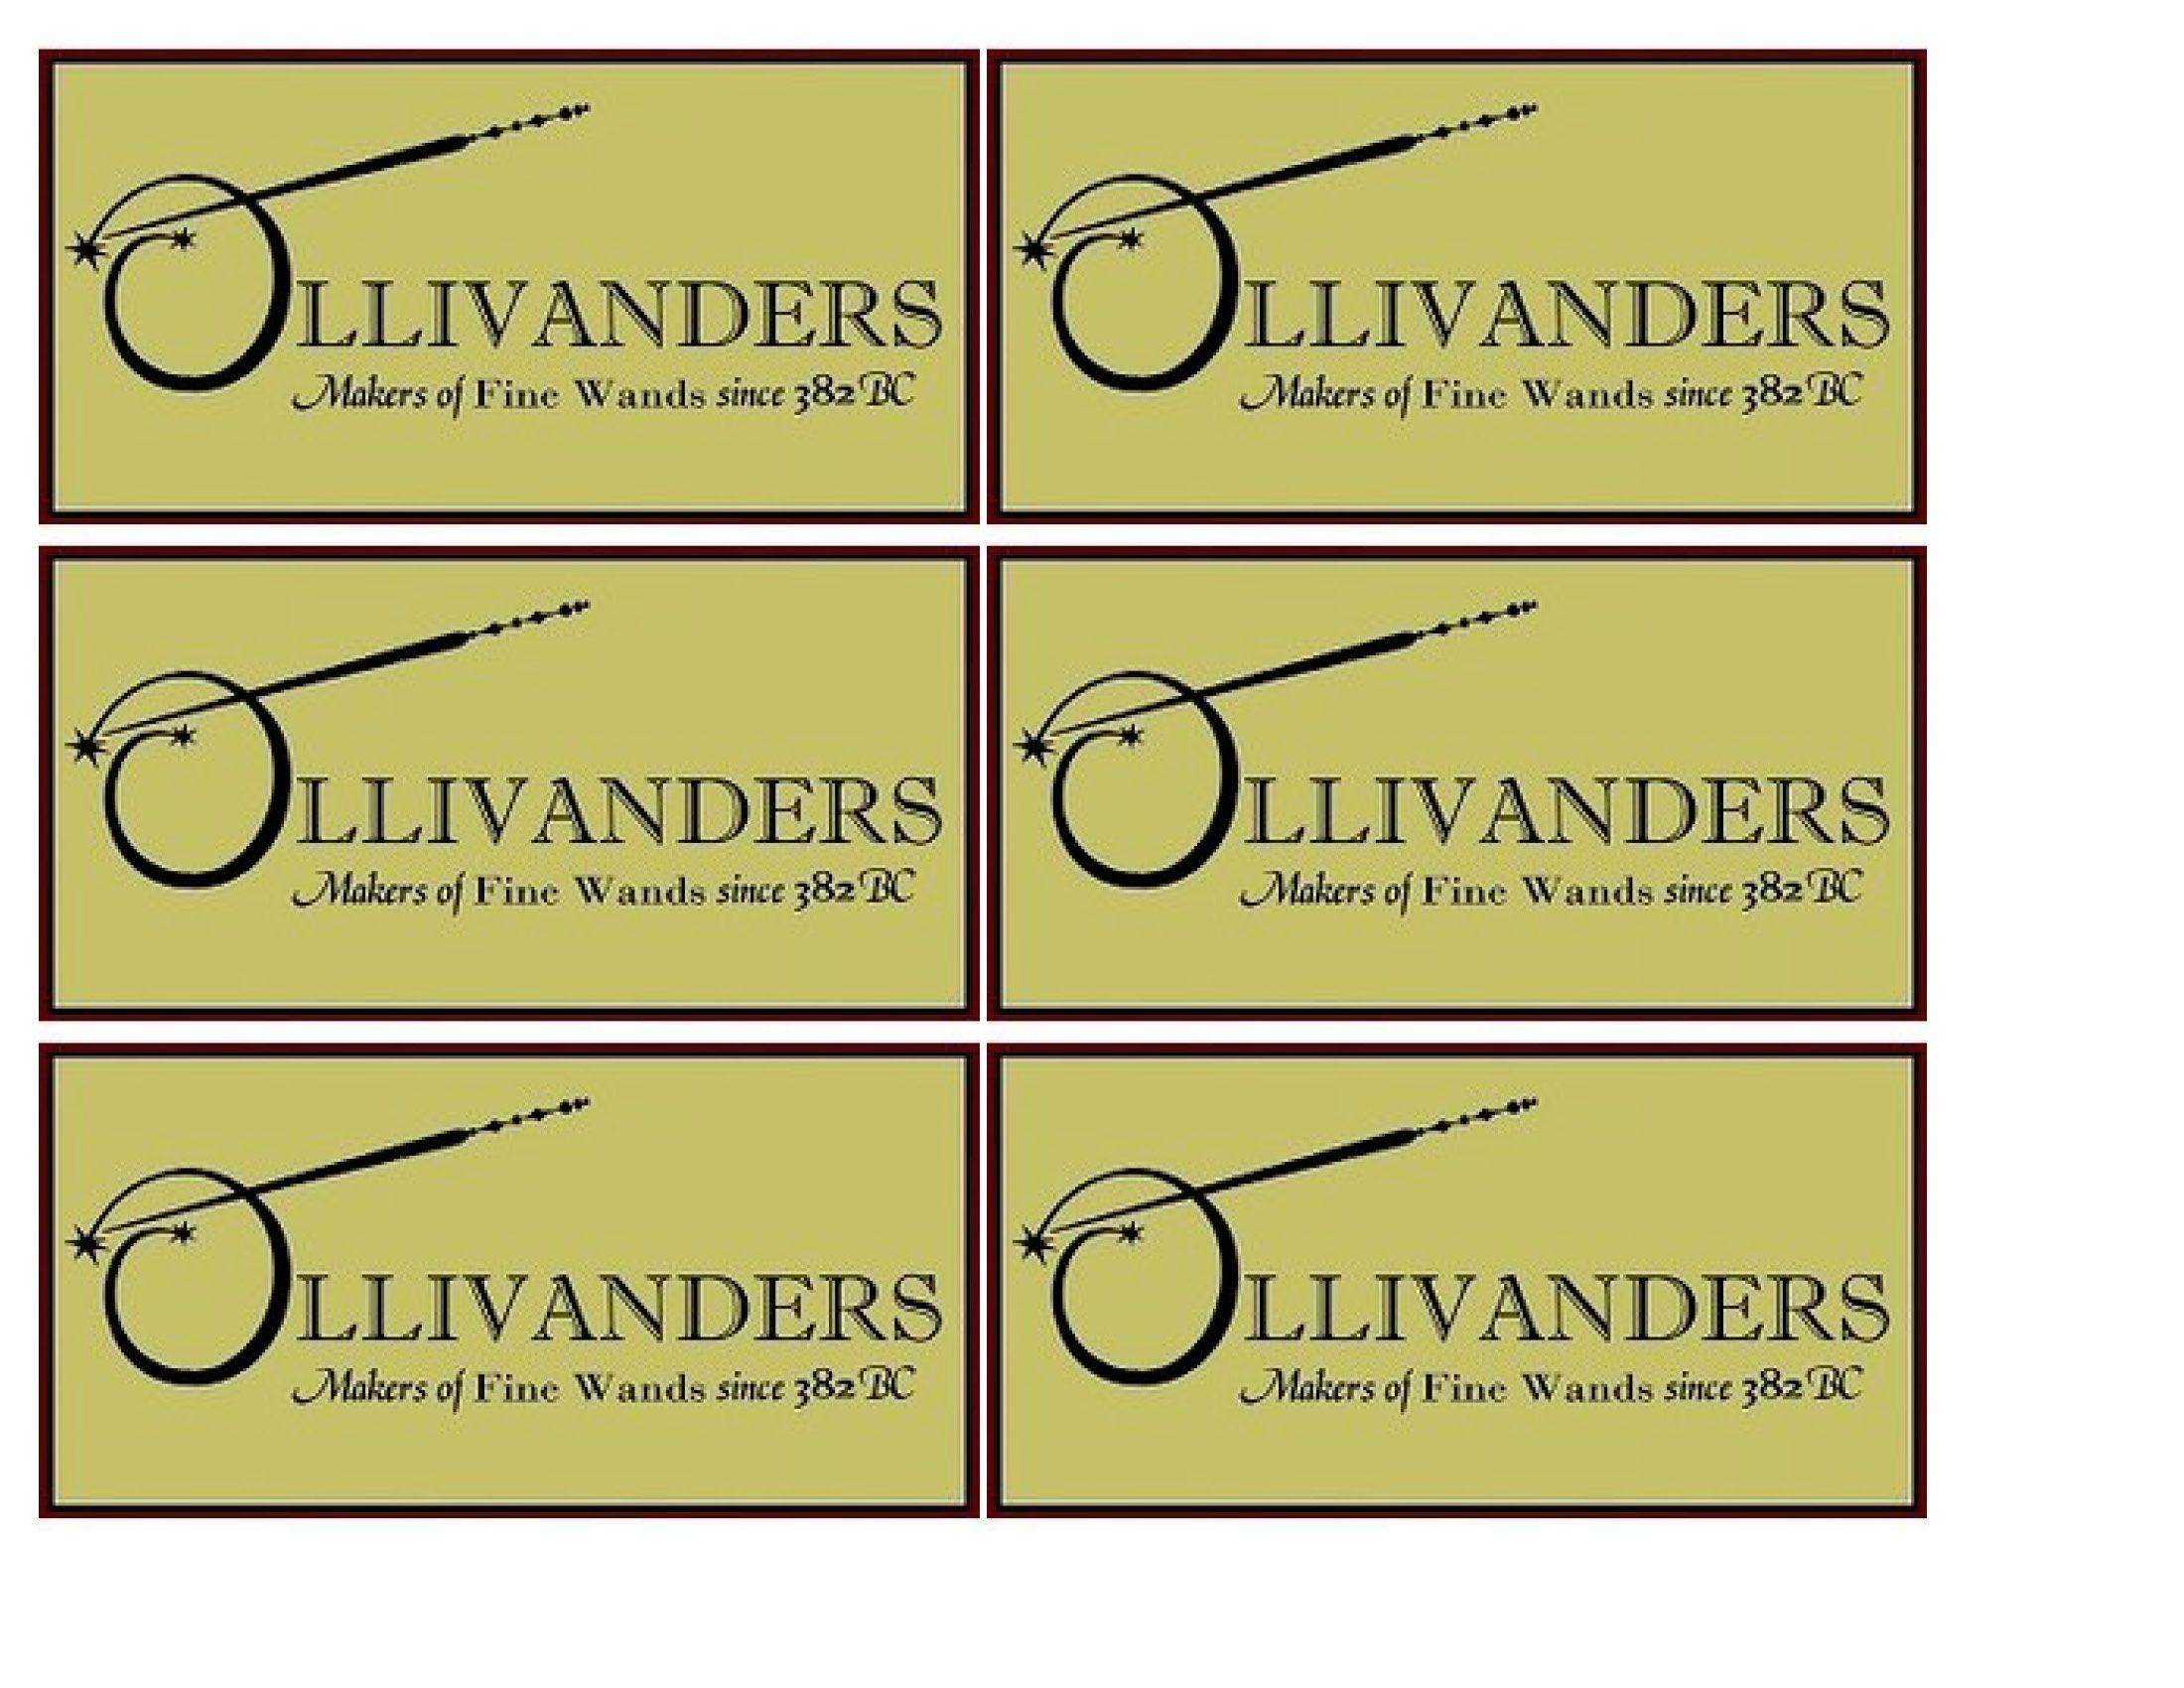 Harry Potter Inspired Wand Box - Ollivanders Wand Box ...